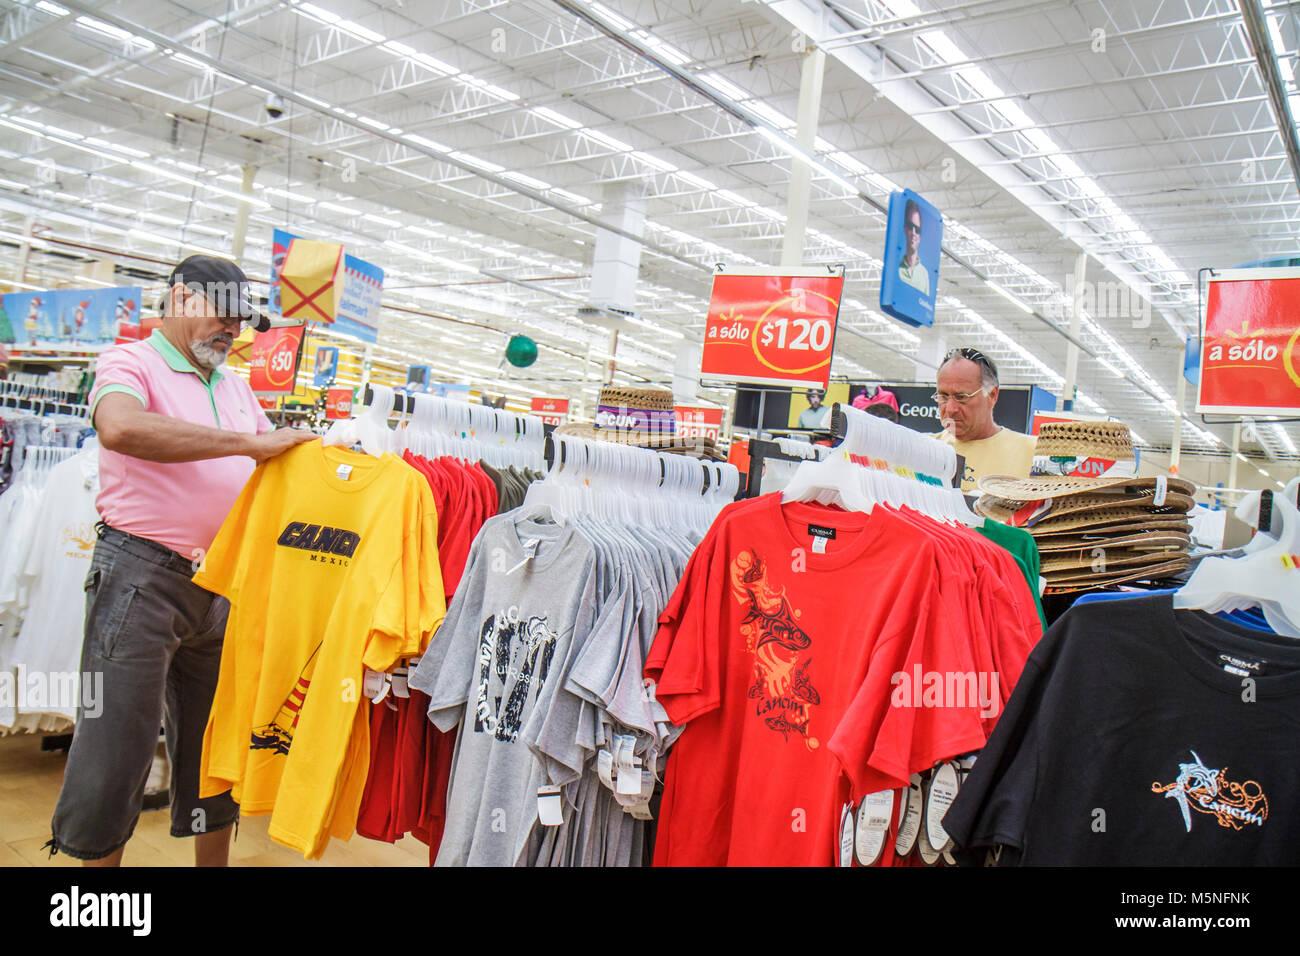 Walmart Store Display Stockfotos & Walmart Store Display Bilder - Alamy